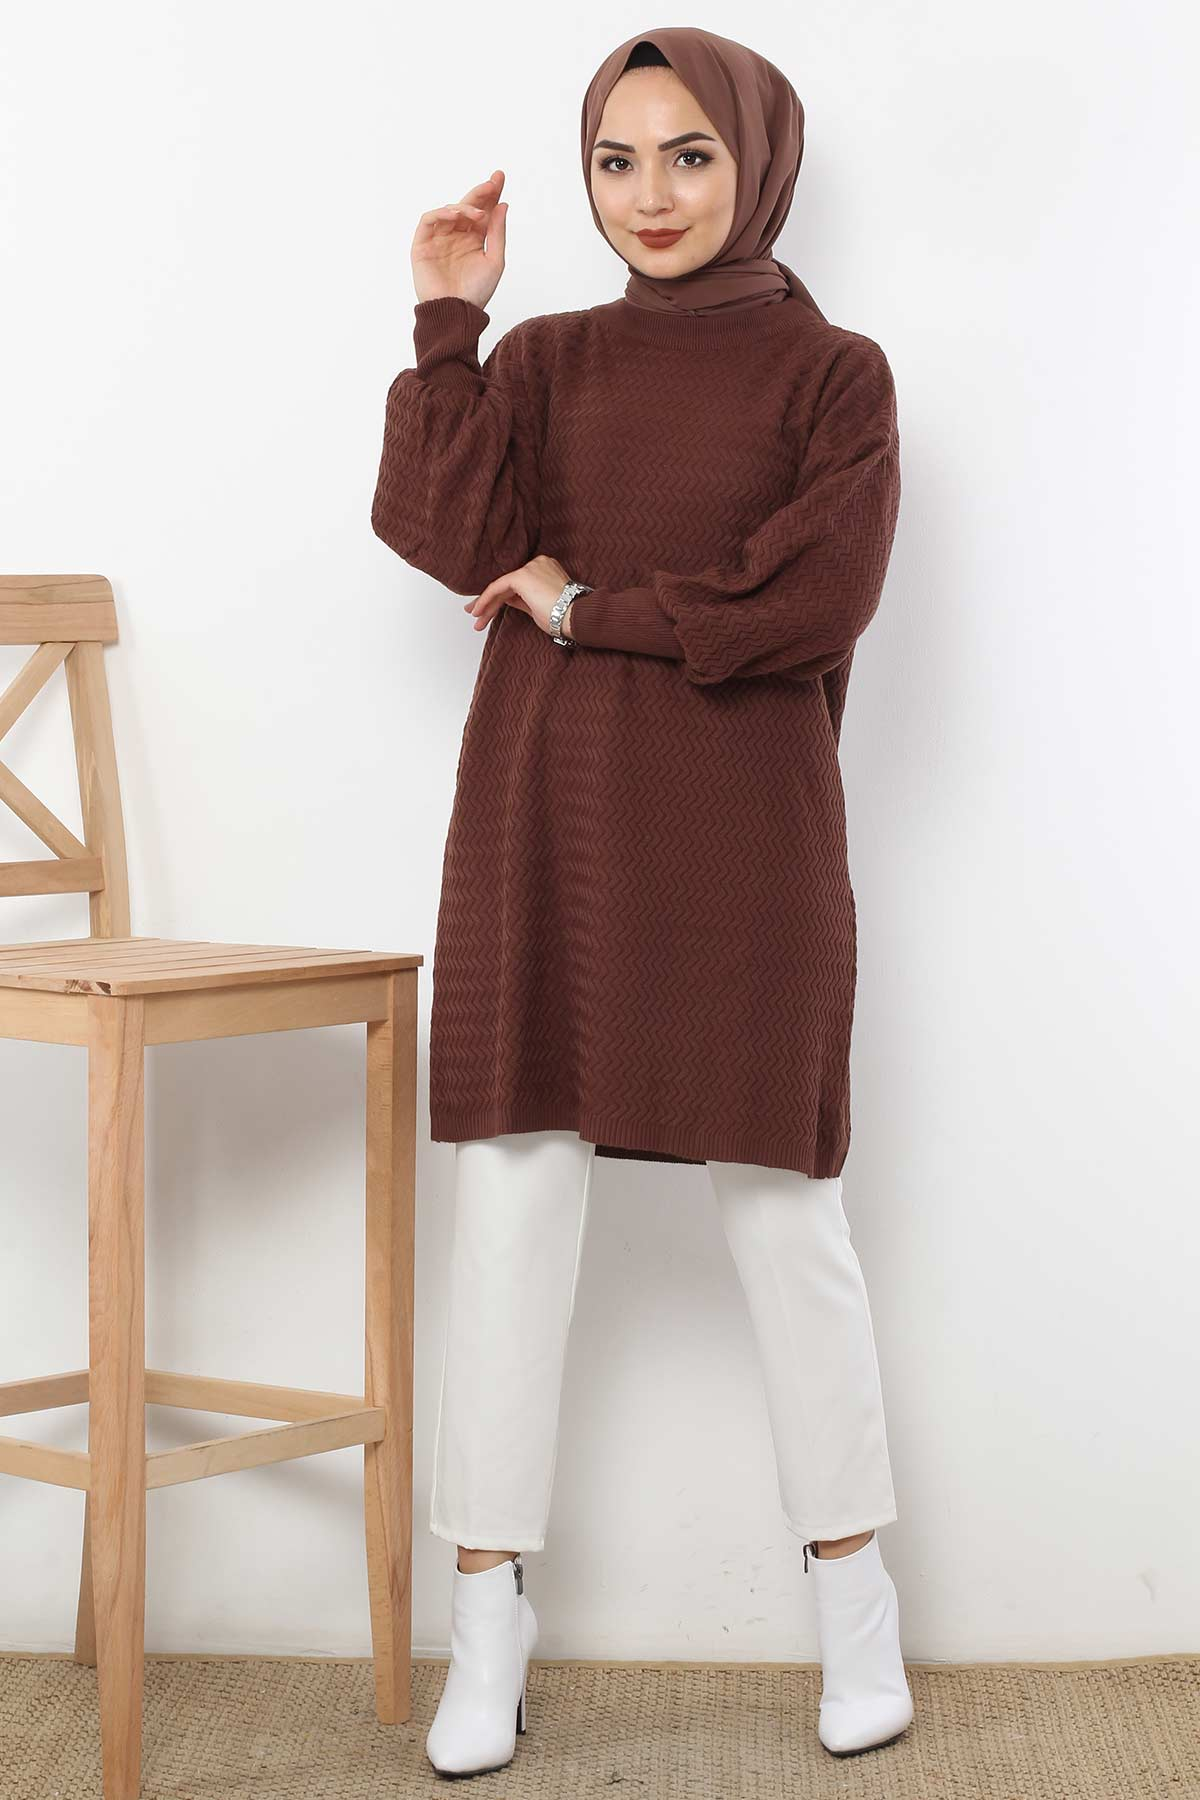 Zigzag Patterned Tricot Tunic TSD5180 Dark Brown